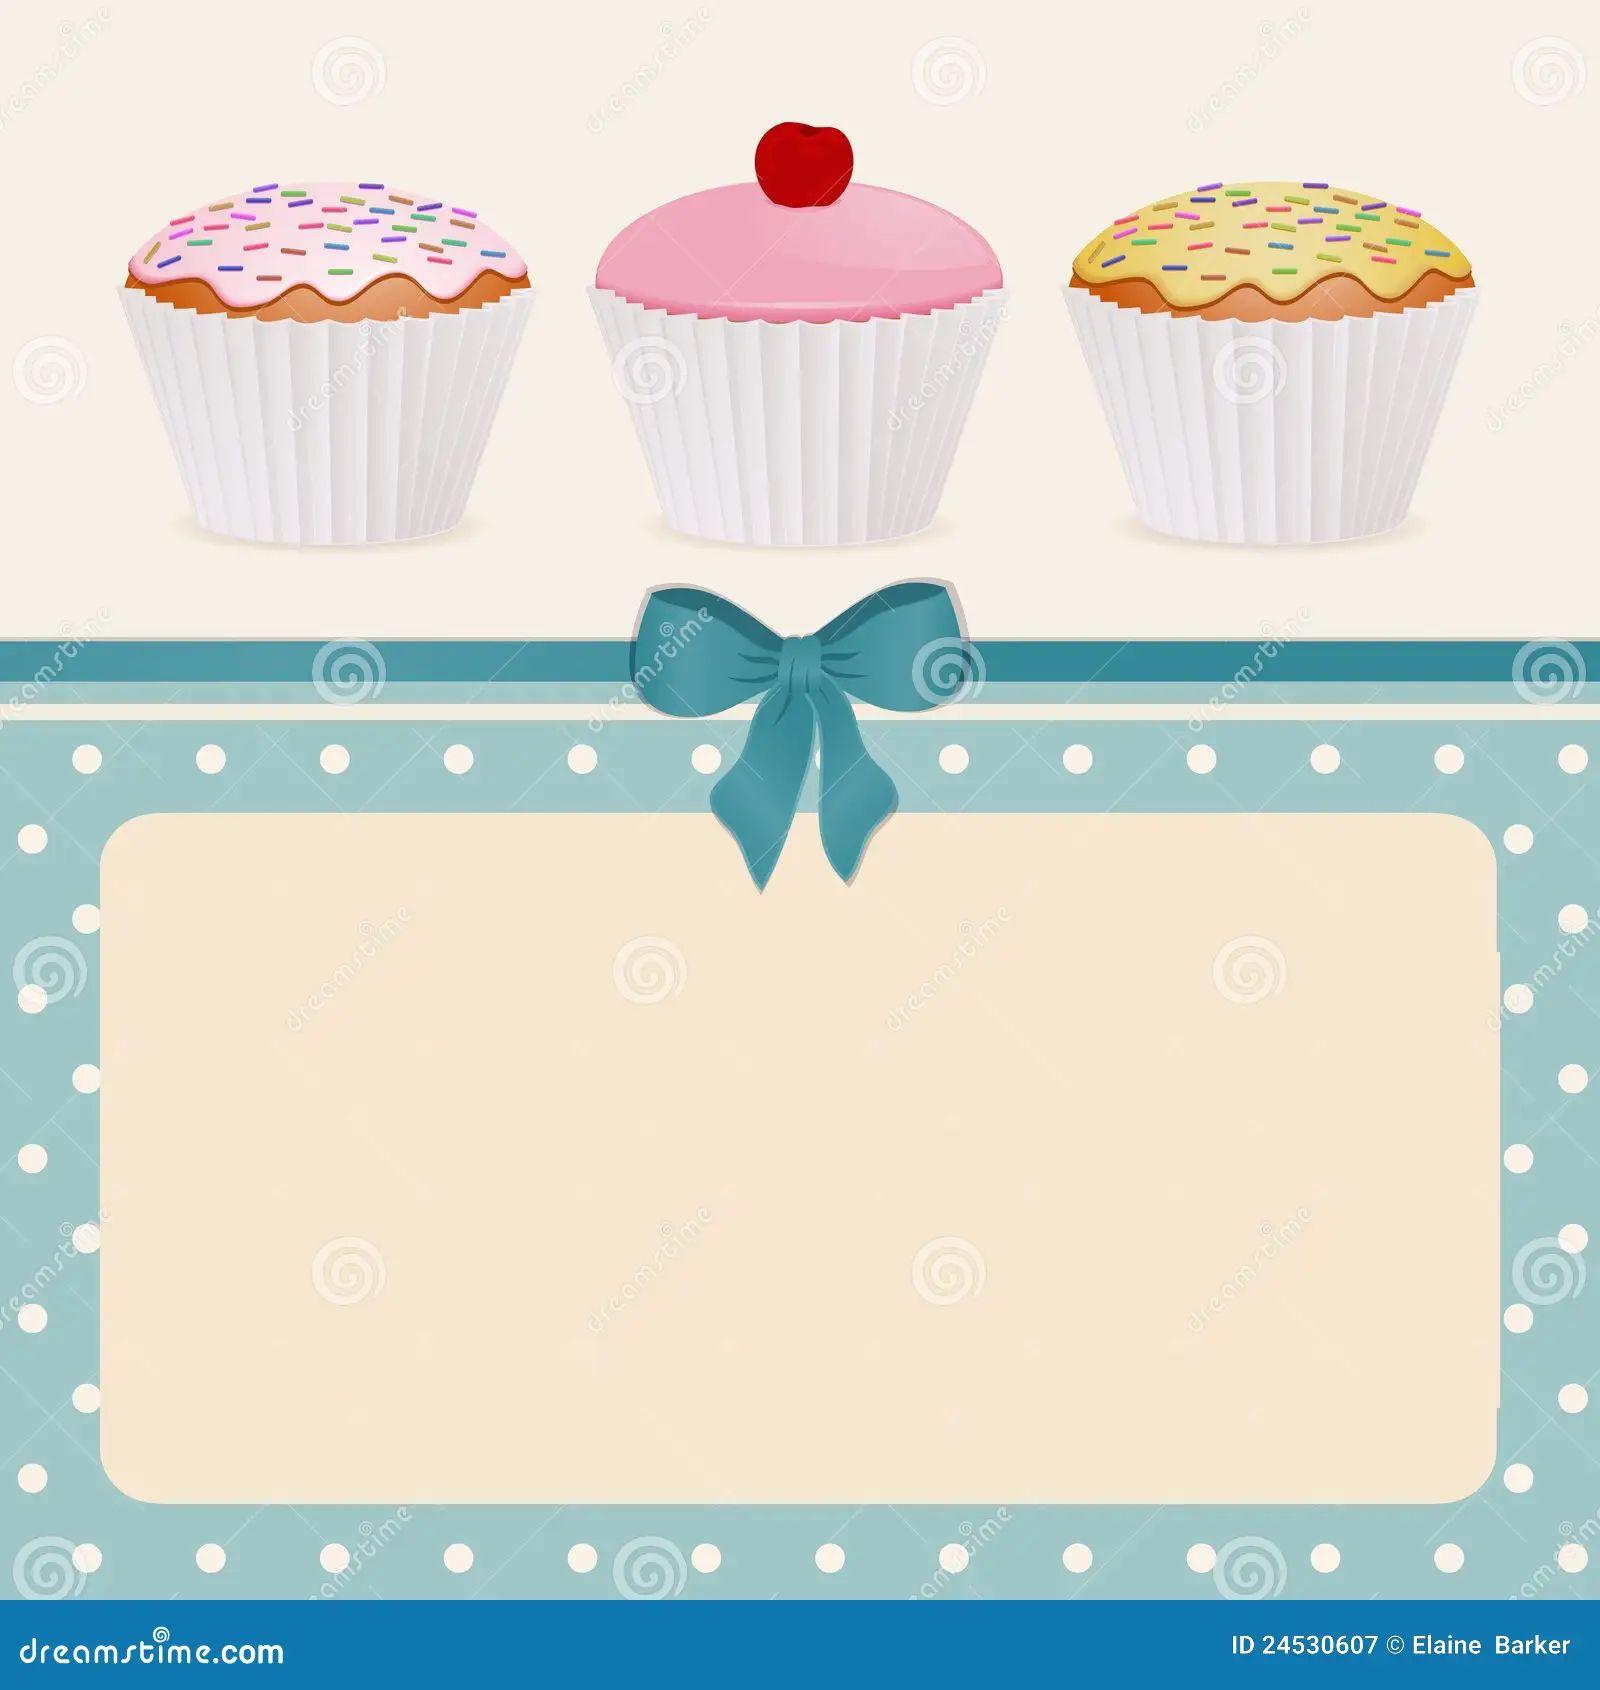 cupcake sale prices